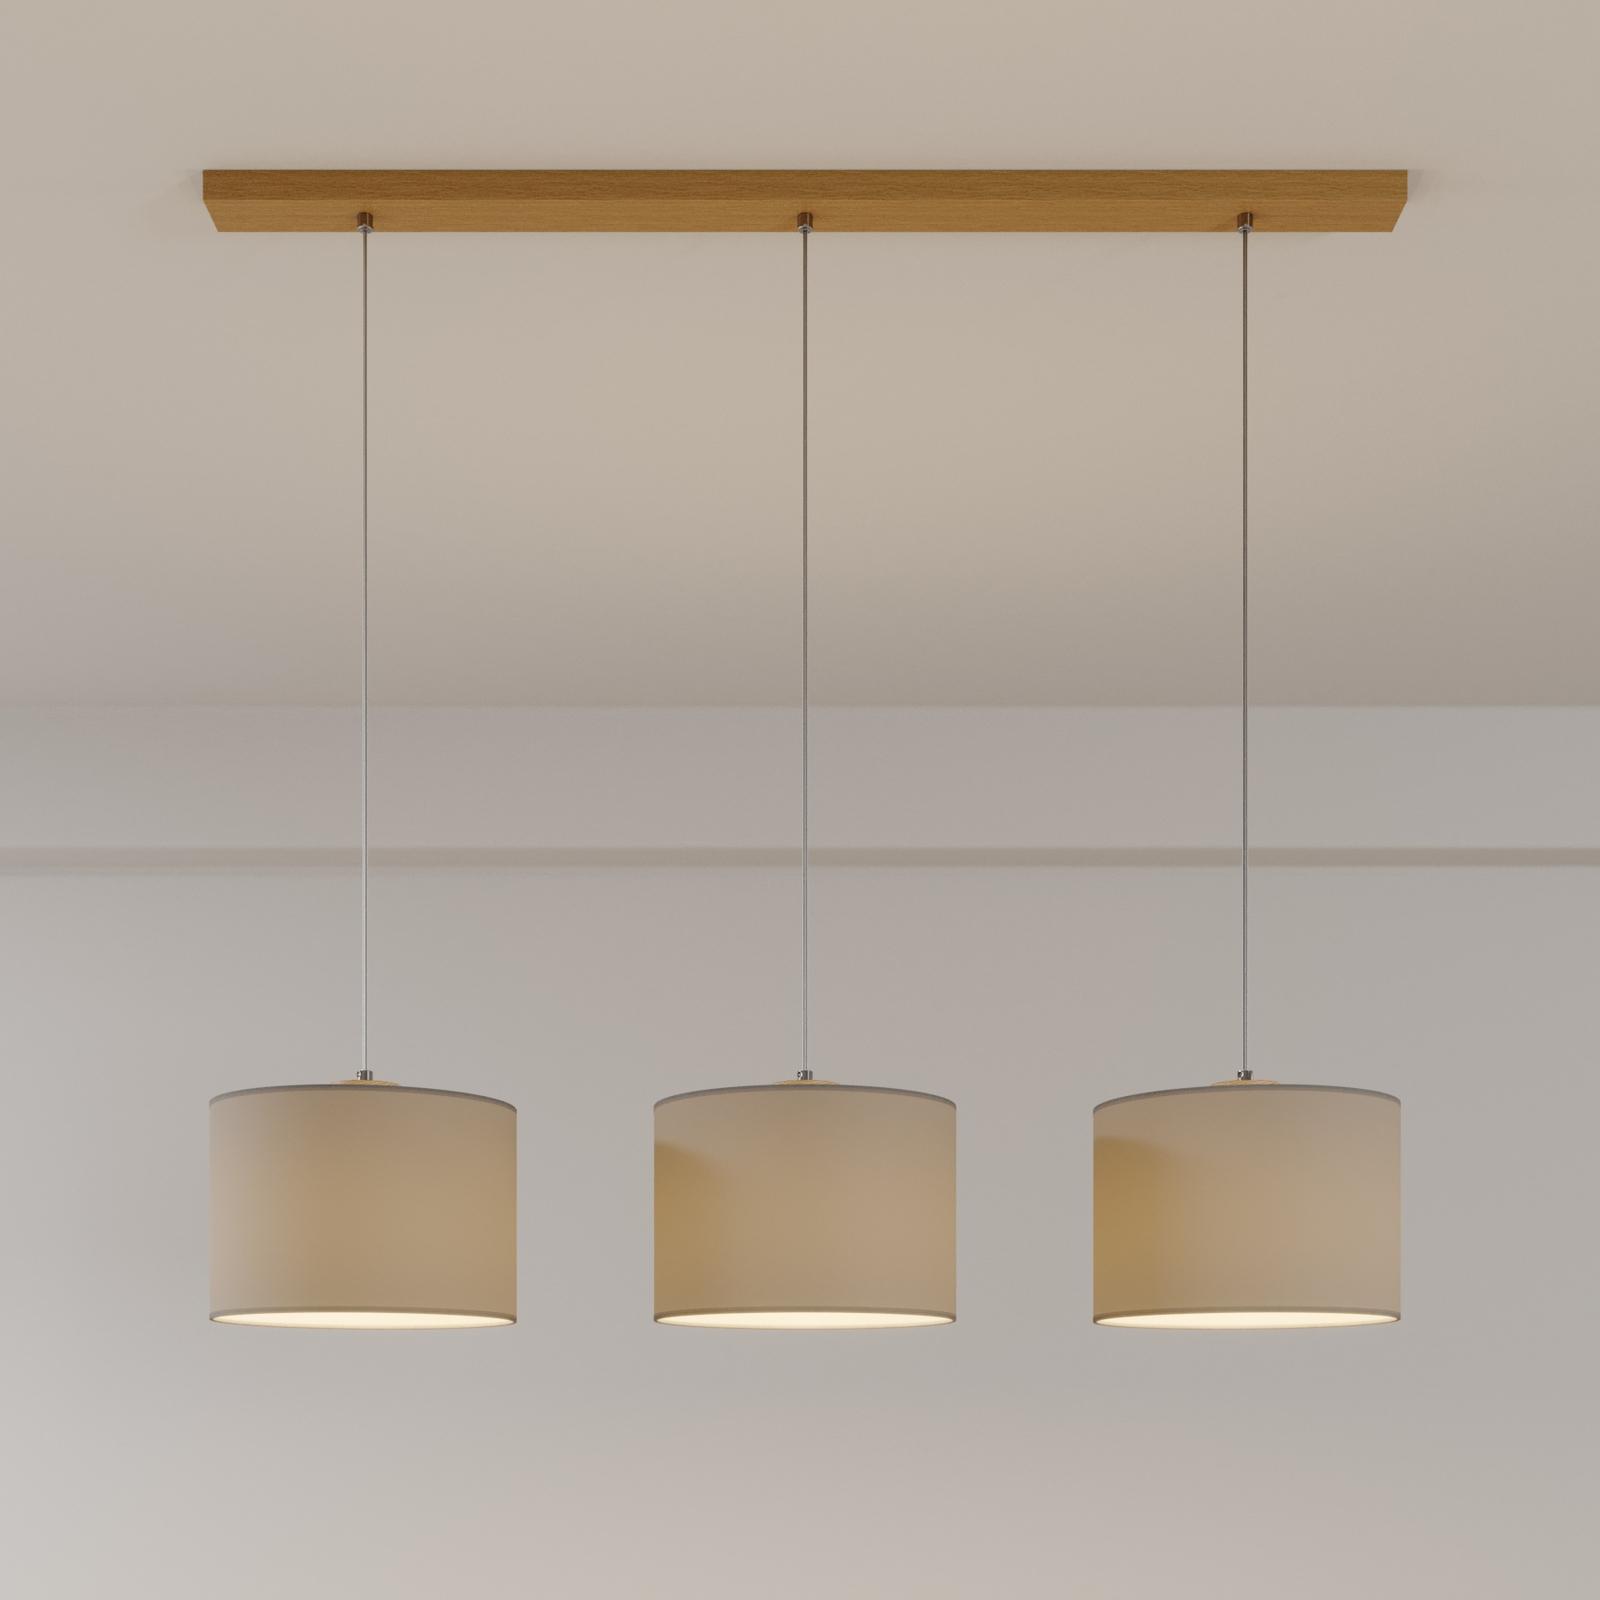 Corralee hængelampe, grå, 3 lyskilder